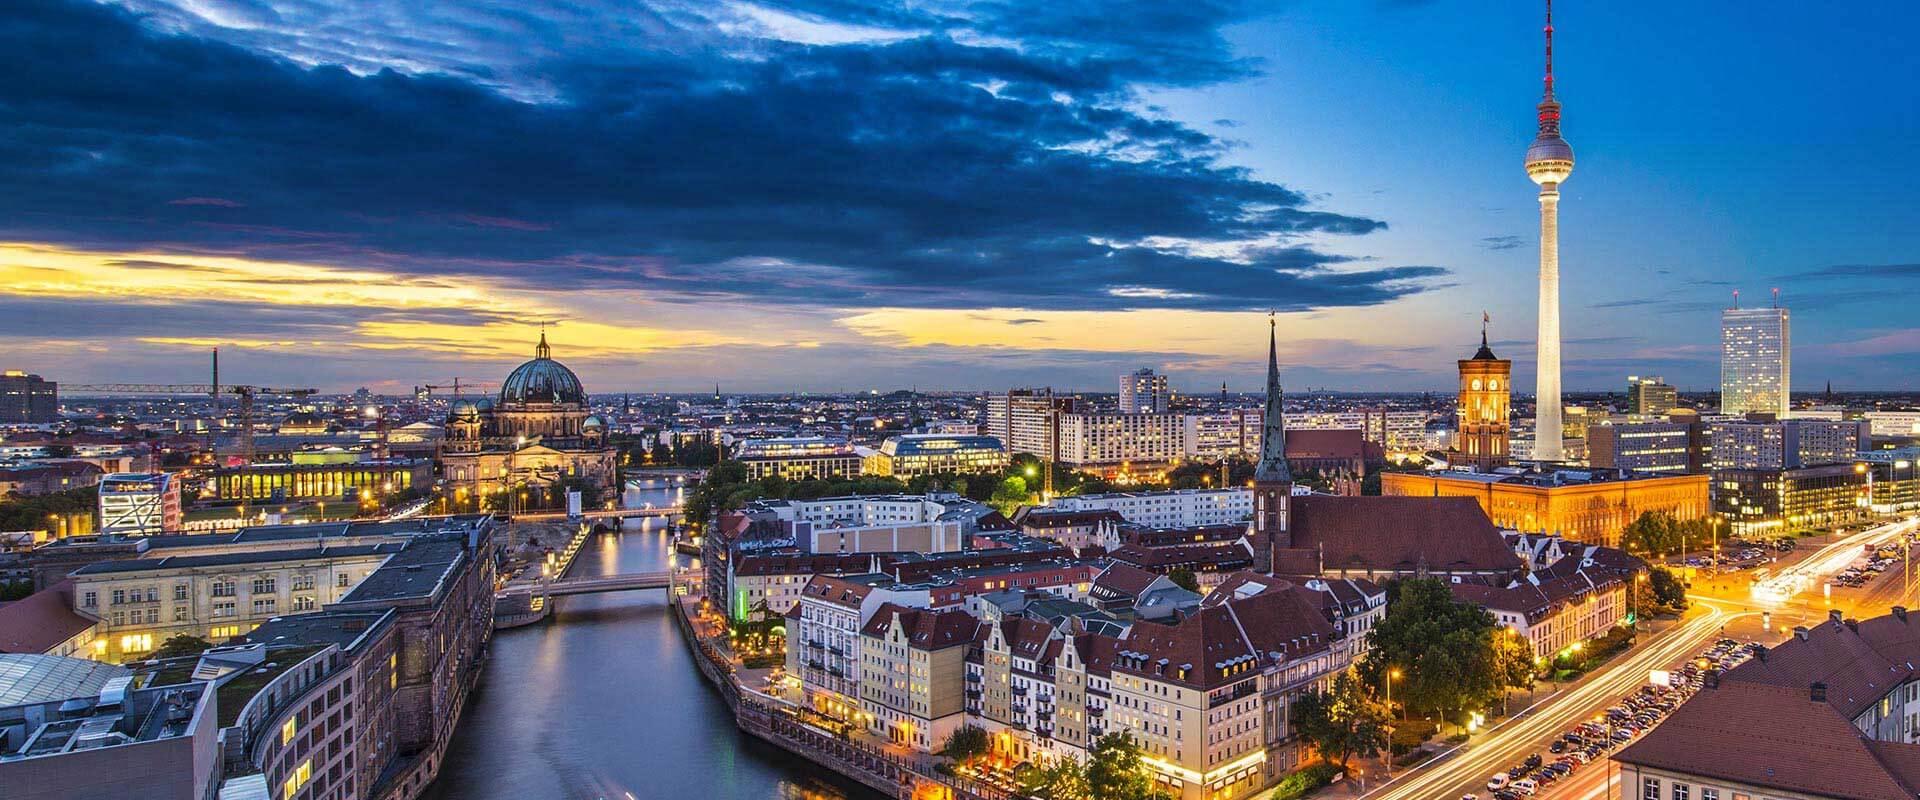 「berlin」の画像検索結果